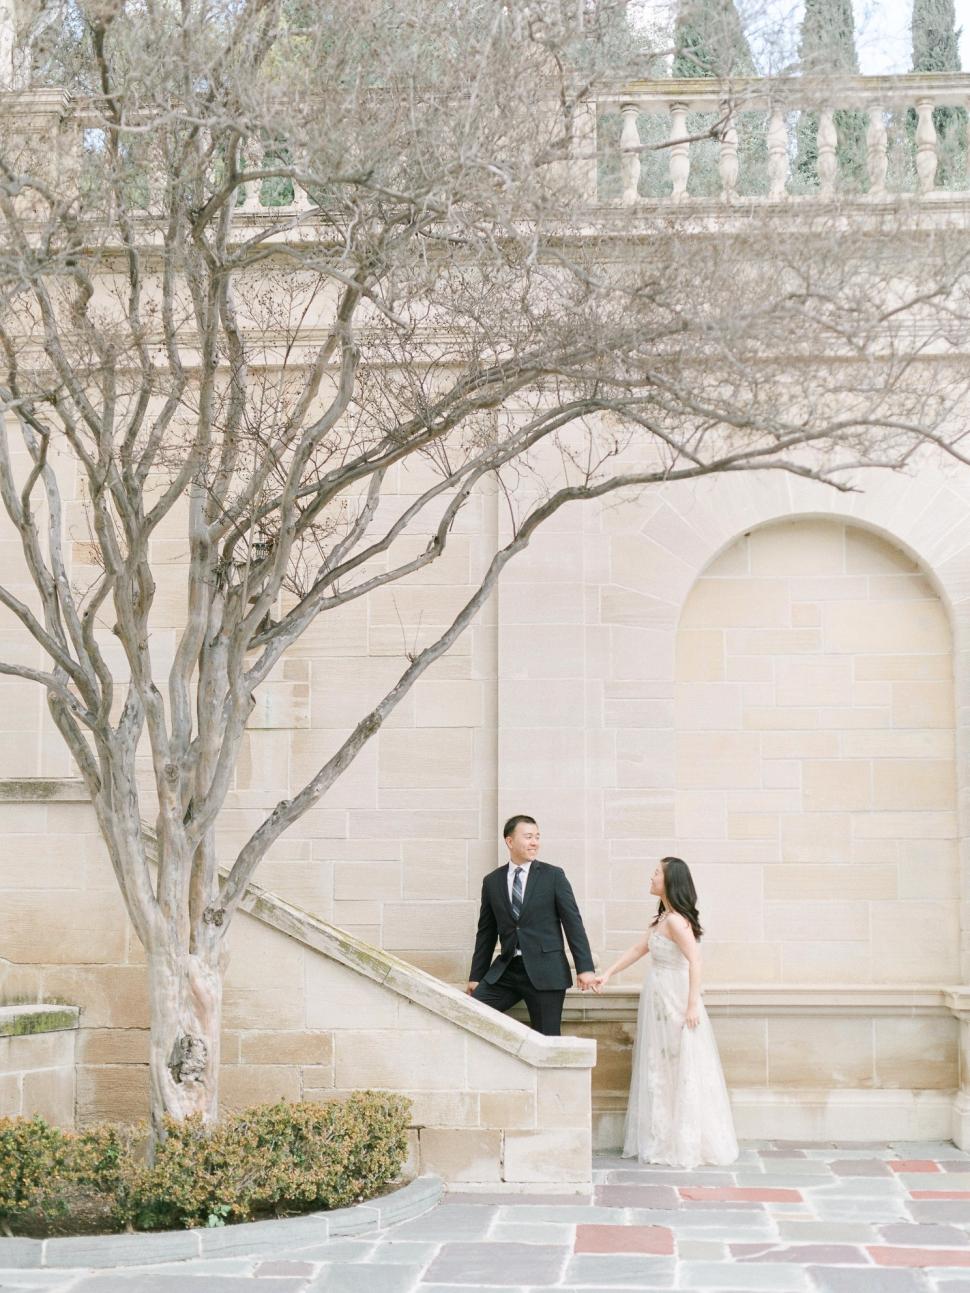 Southern-California-Wedding-Photographer-Cassi-Claire-Greystone-Mansion-Beverly-Hills-CA-wedding_03.jpg